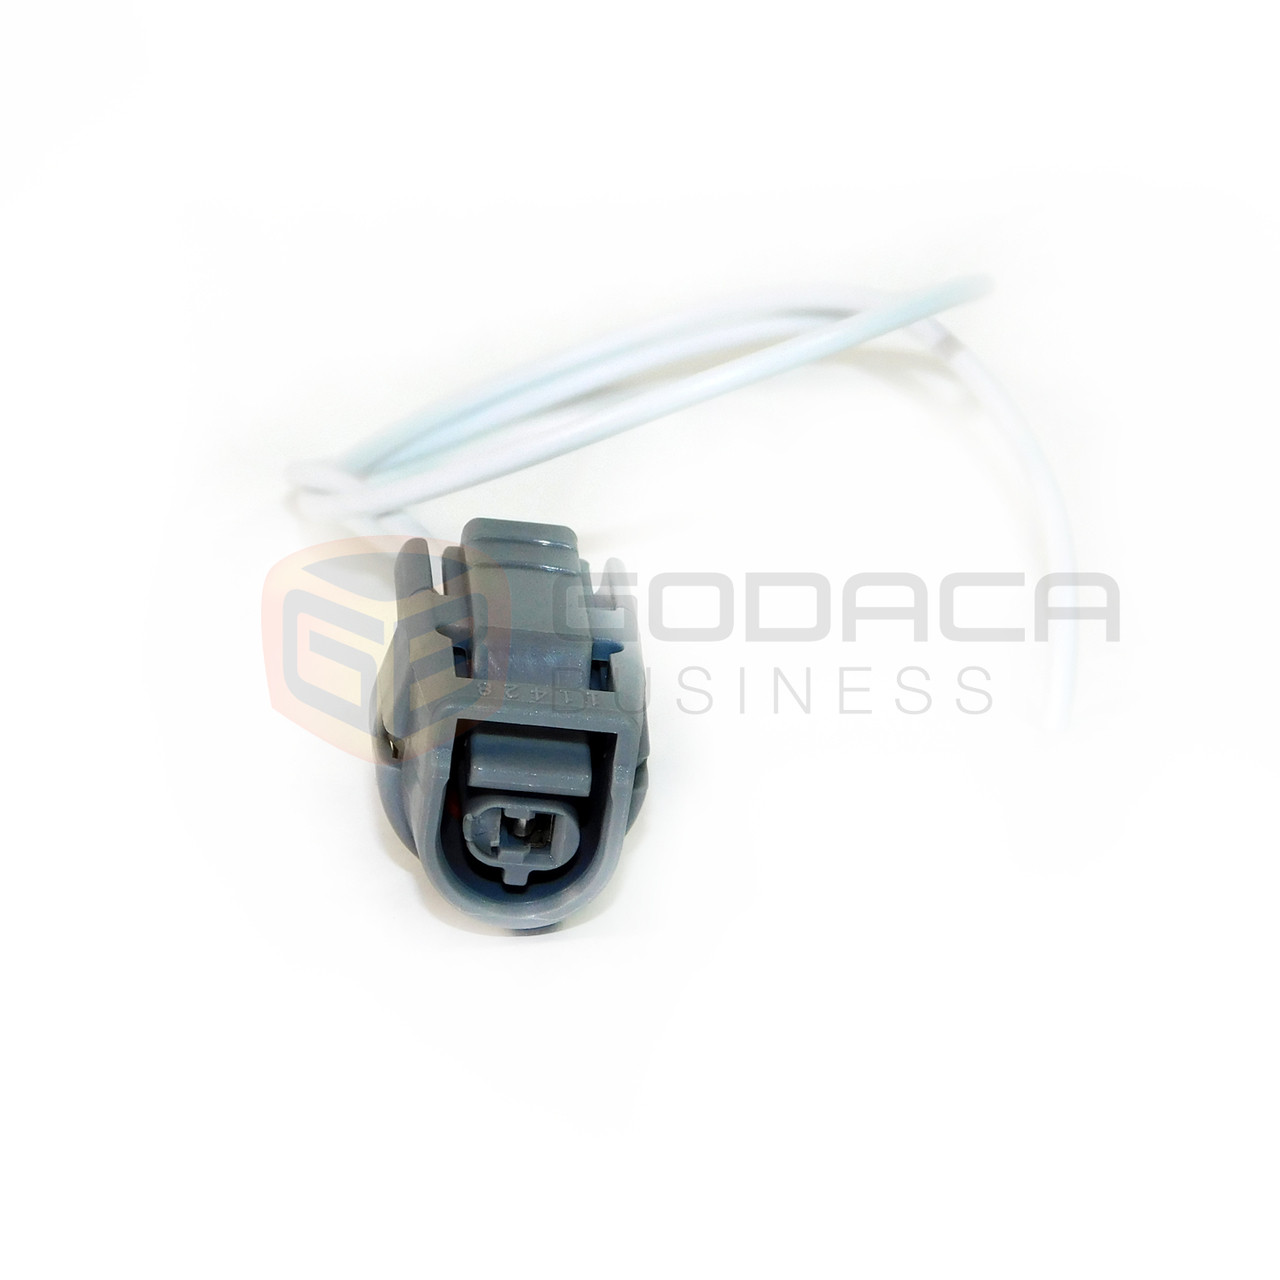 1x connector temperature sensor for toyota 2jz 90980 11428 with wire automotive wire connectors 1x connector temperature sensor for toyota 2jz 90980 11428 with wire